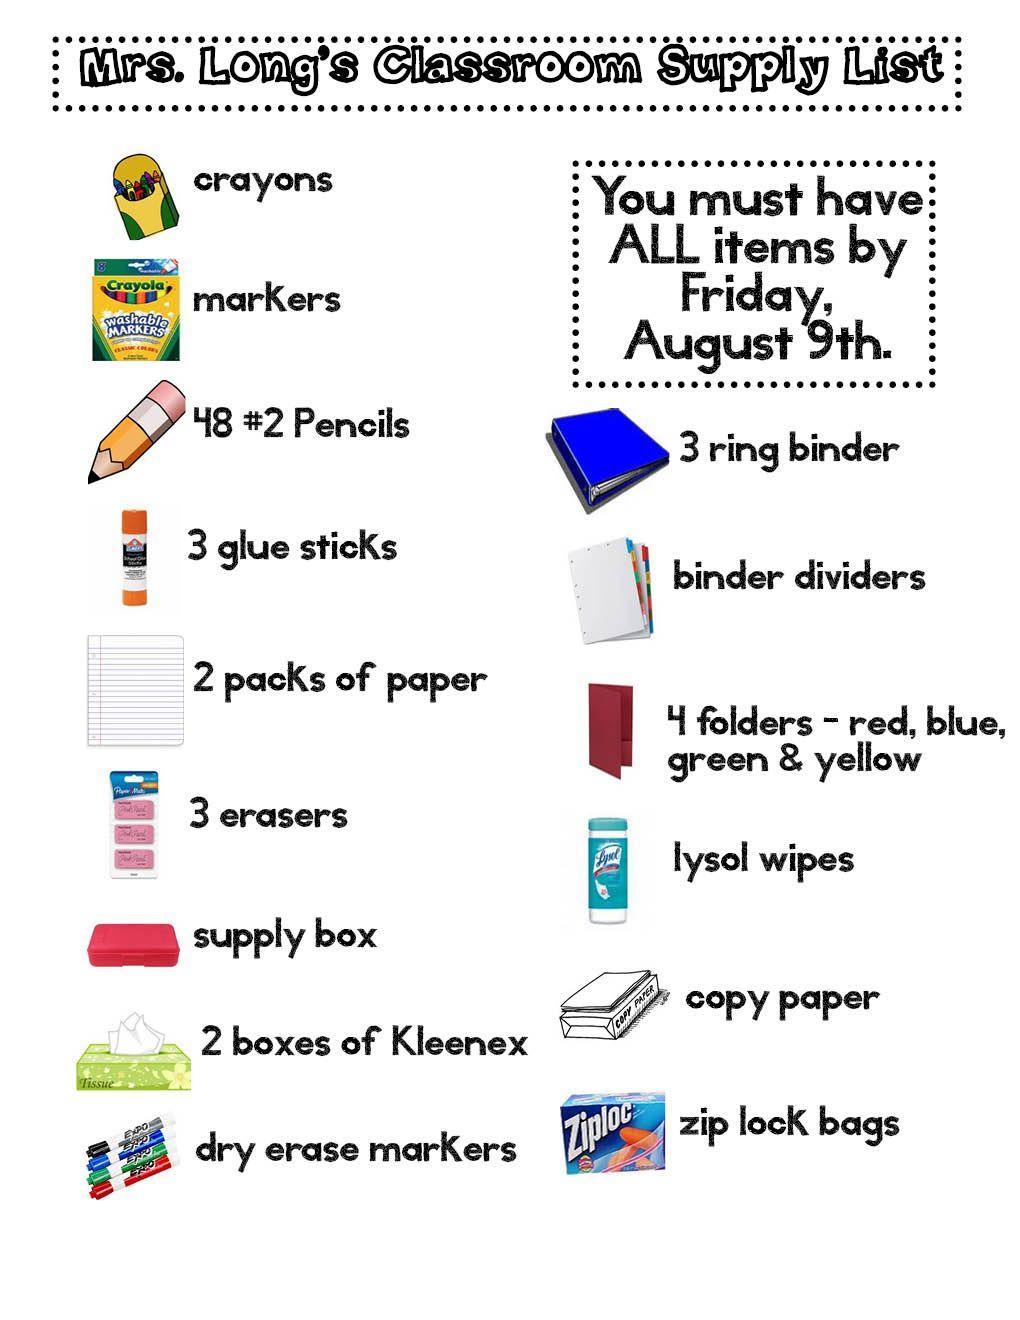 Supply List School Supplies List Classroom Supplies School Supplies